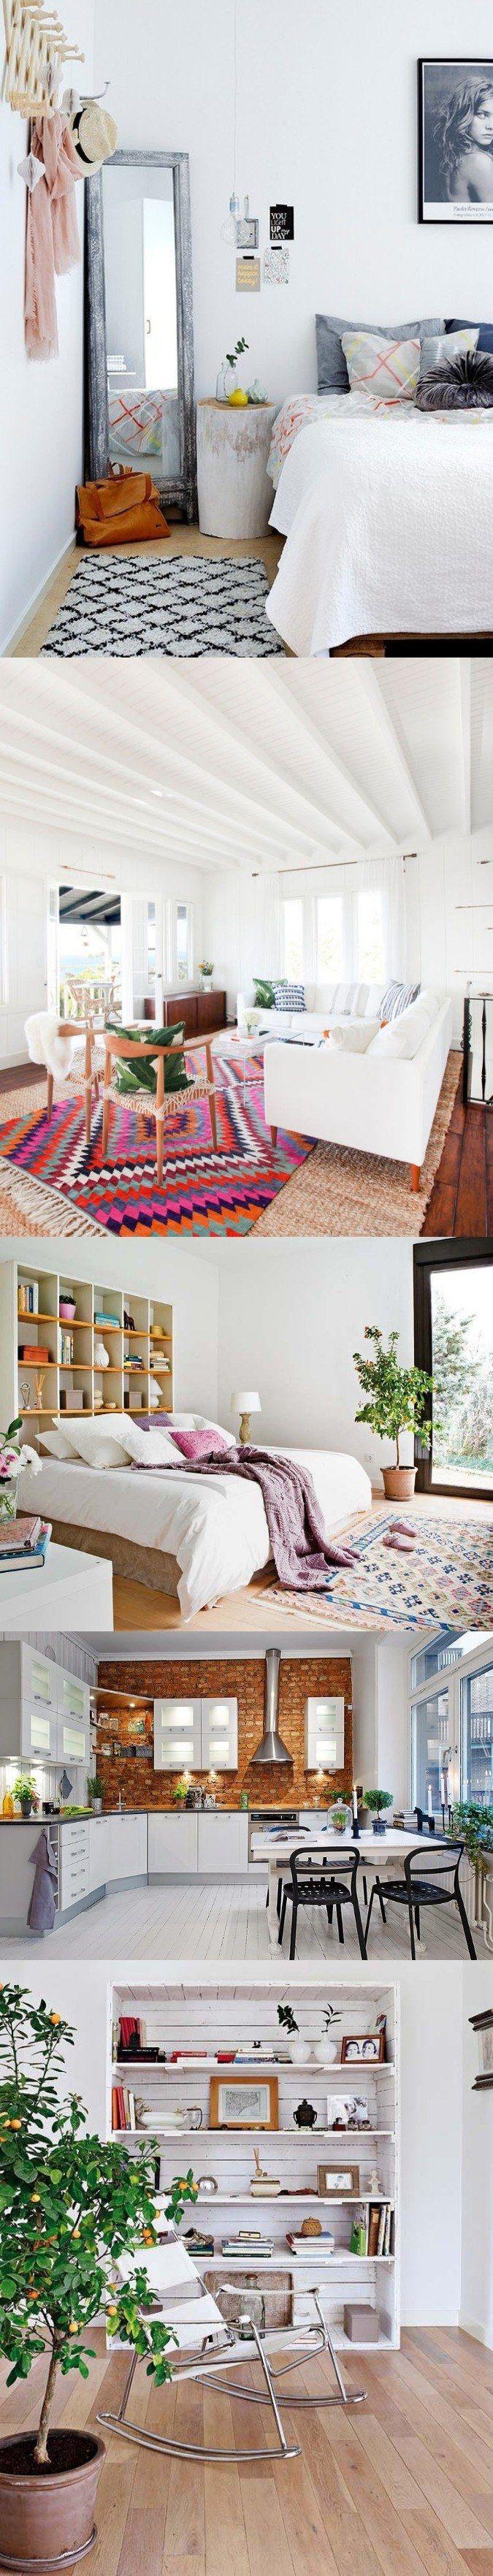 5 ideas para que tu casa sea más natural 7 http://www.decorarmicasa.com/